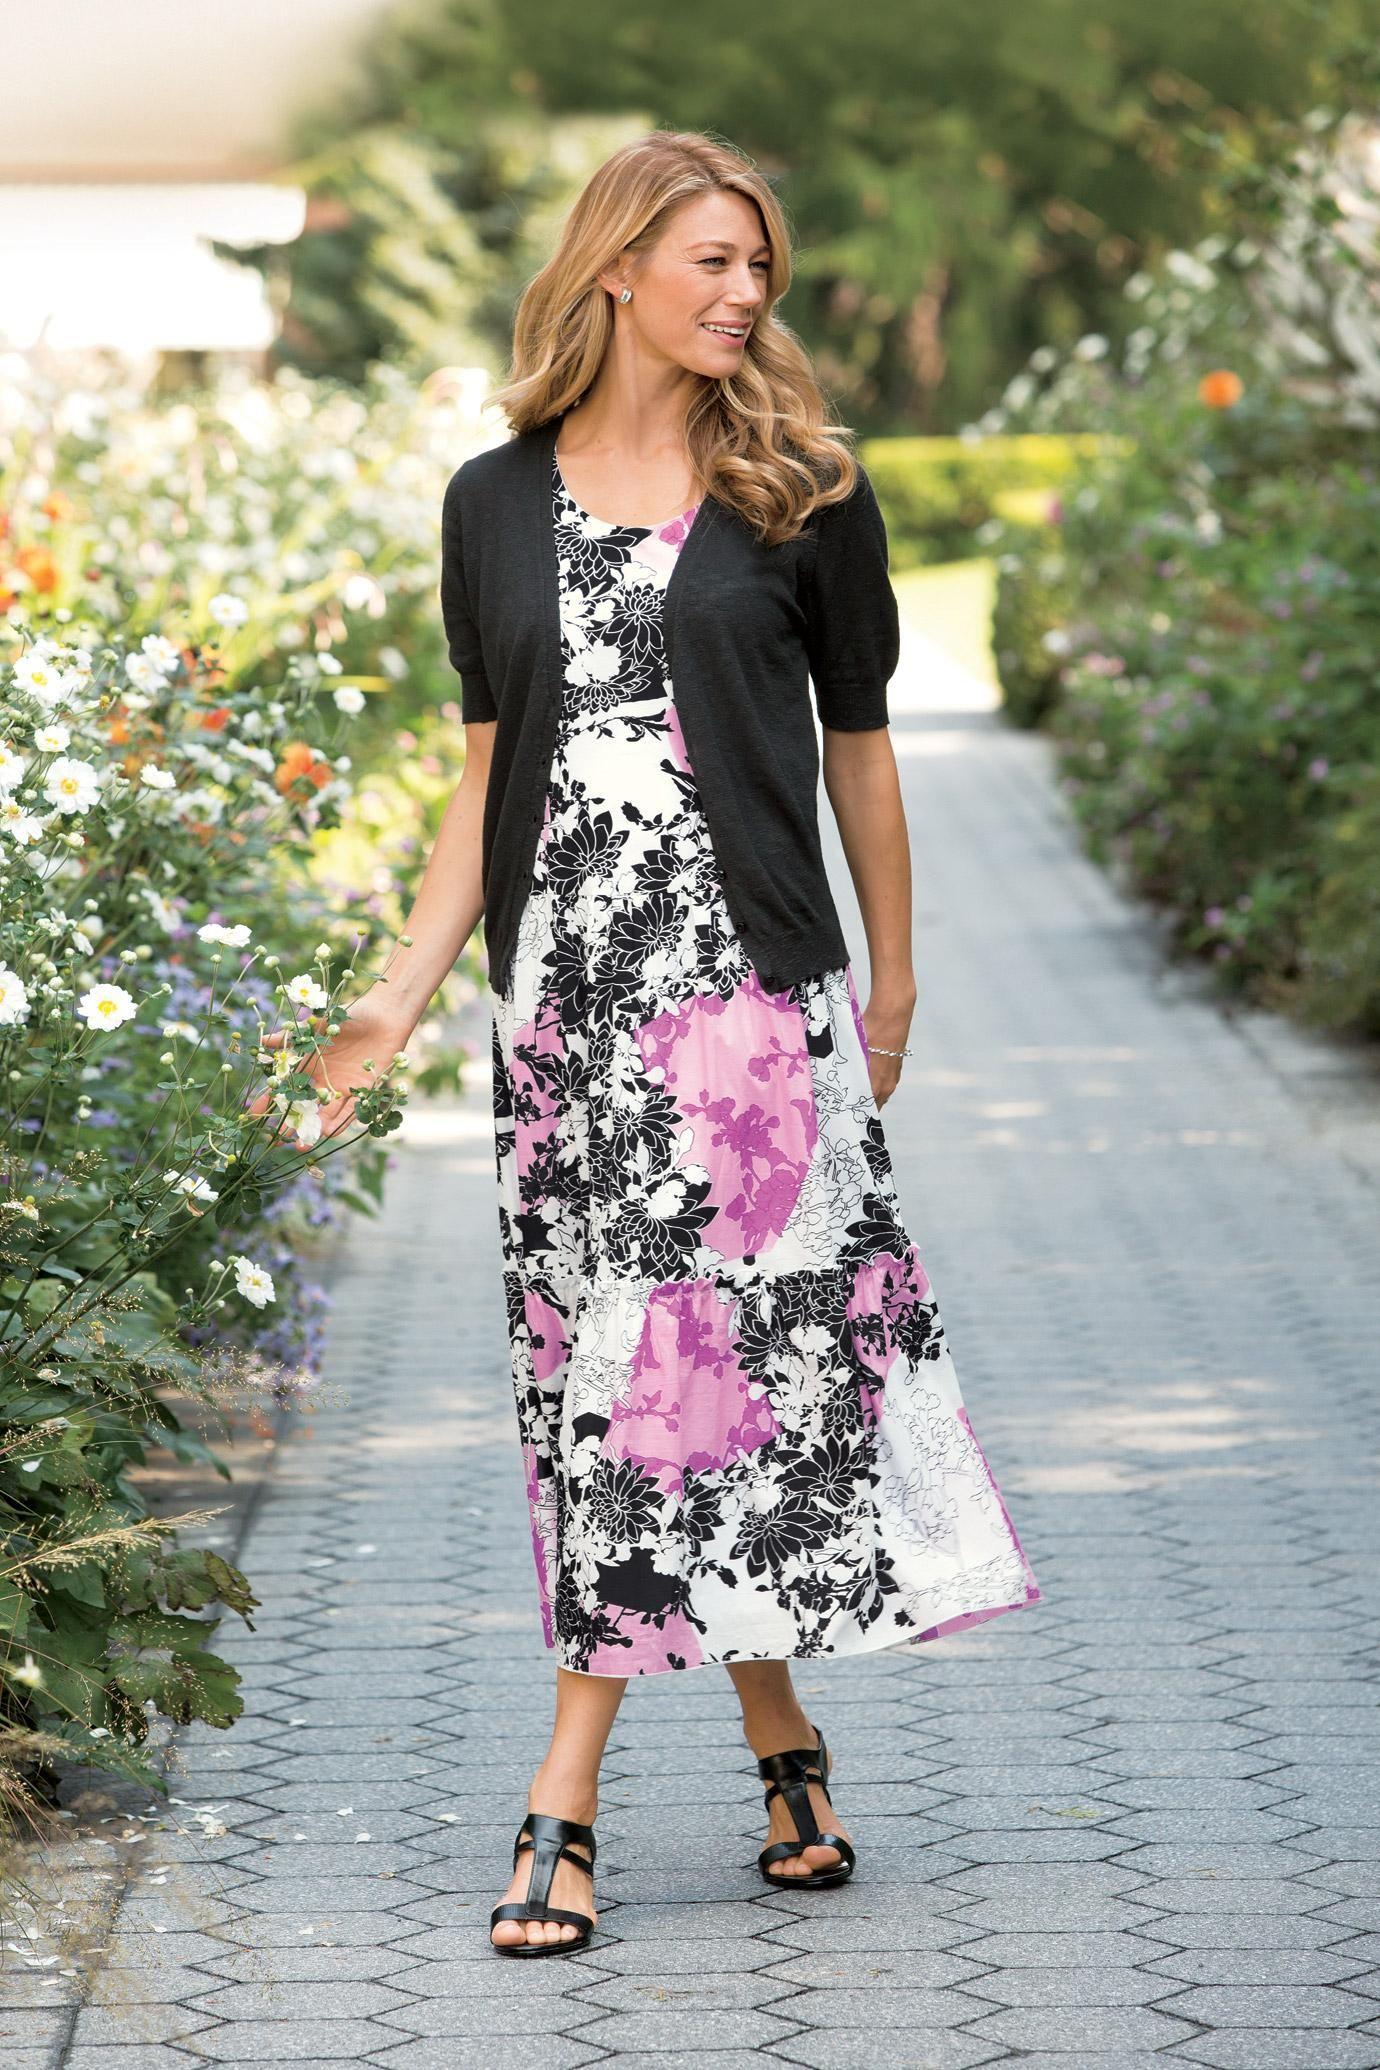 Graphic Floral Dress & Short Sleeve Cardigan | Fashion | Pinterest ...